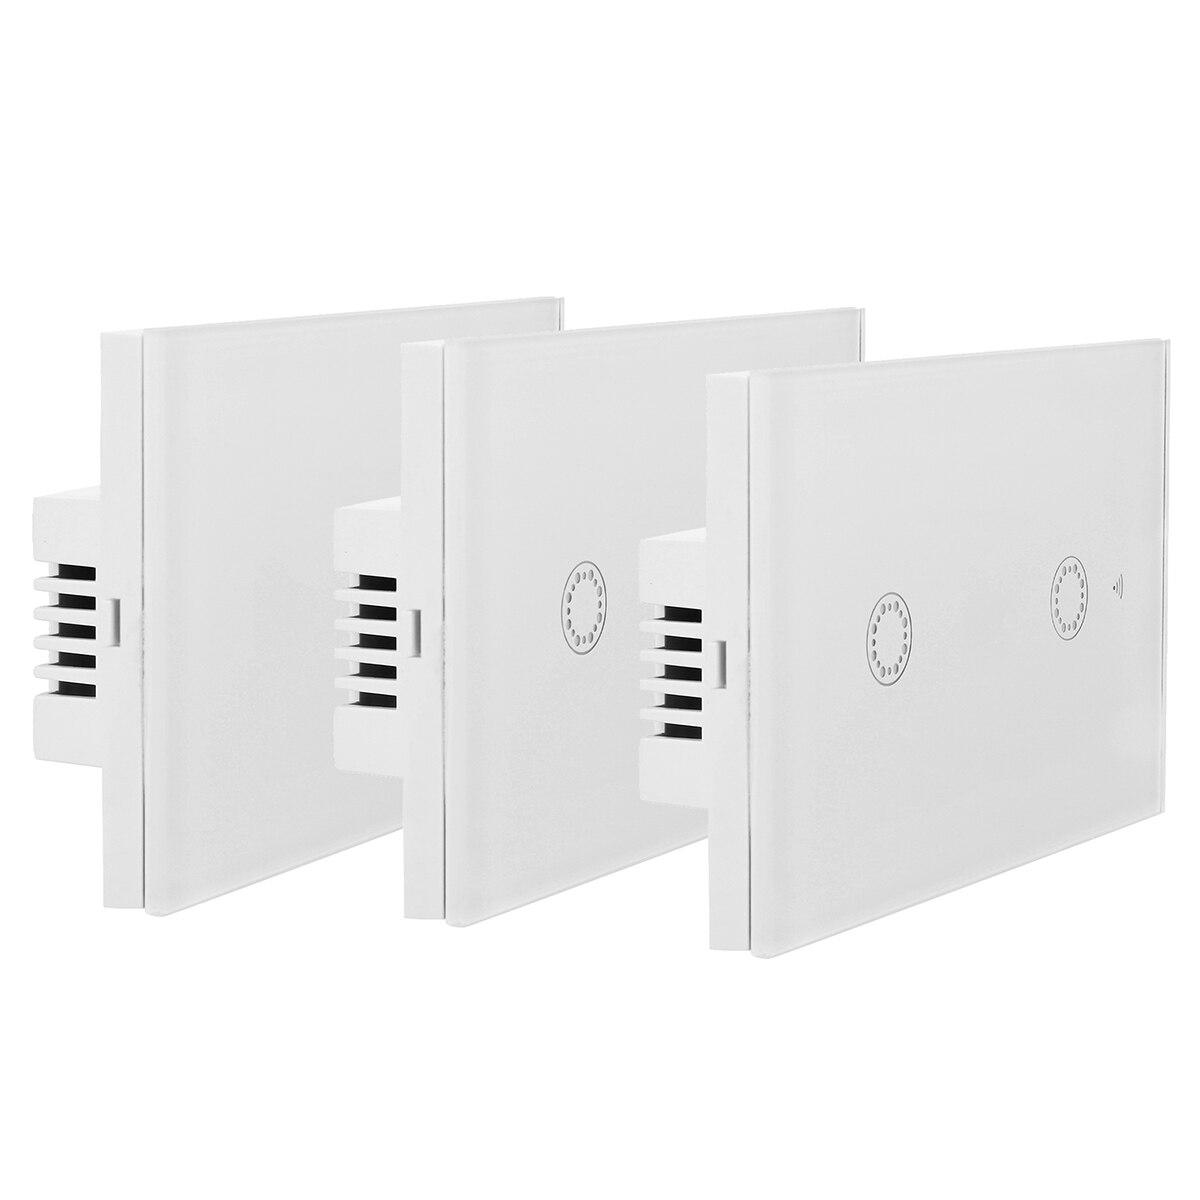 90-250V 1000W WiFi táctil Schalter 1/banda 2/3 interruptor táctil inteligente interruptor de la luz del Panel de la pared interruptor App-Steuerung varita schalter